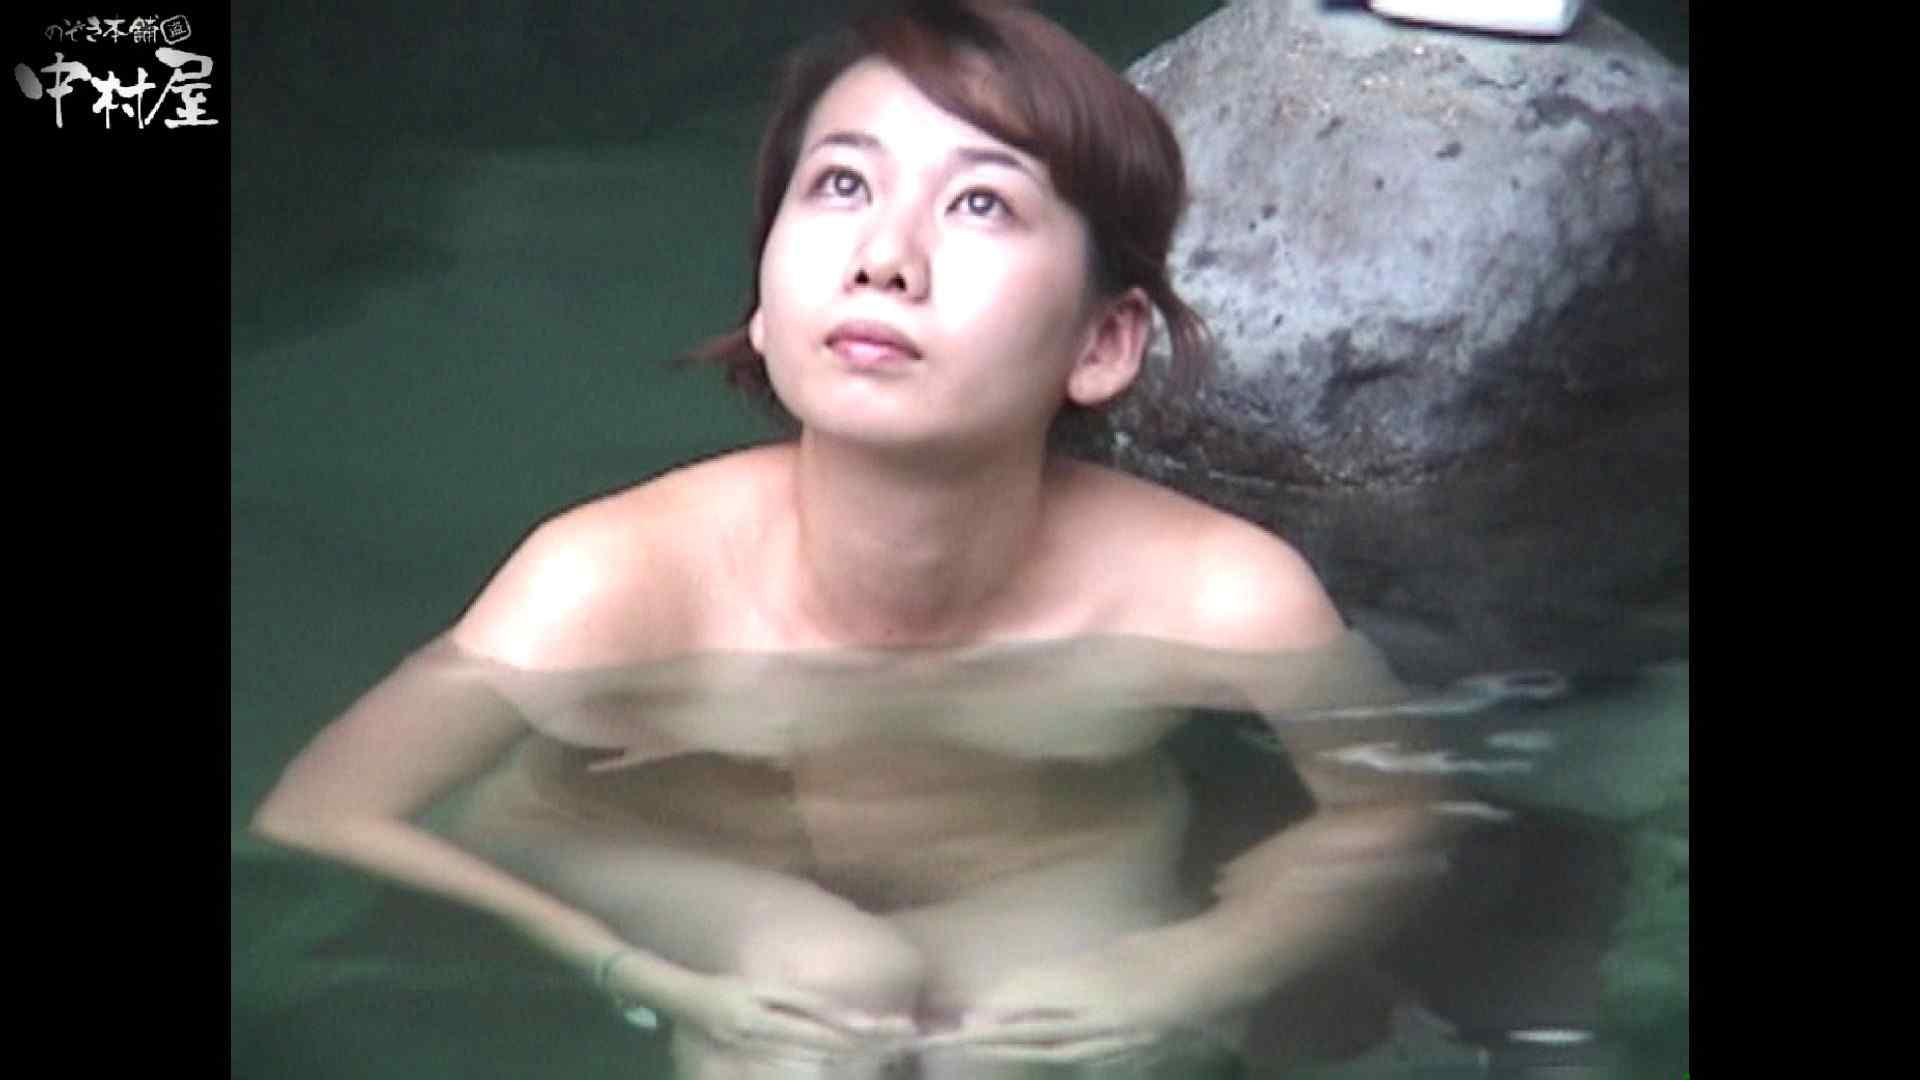 Aquaな露天風呂Vol.951 盗撮師作品 | 露天風呂突入  96pic 43